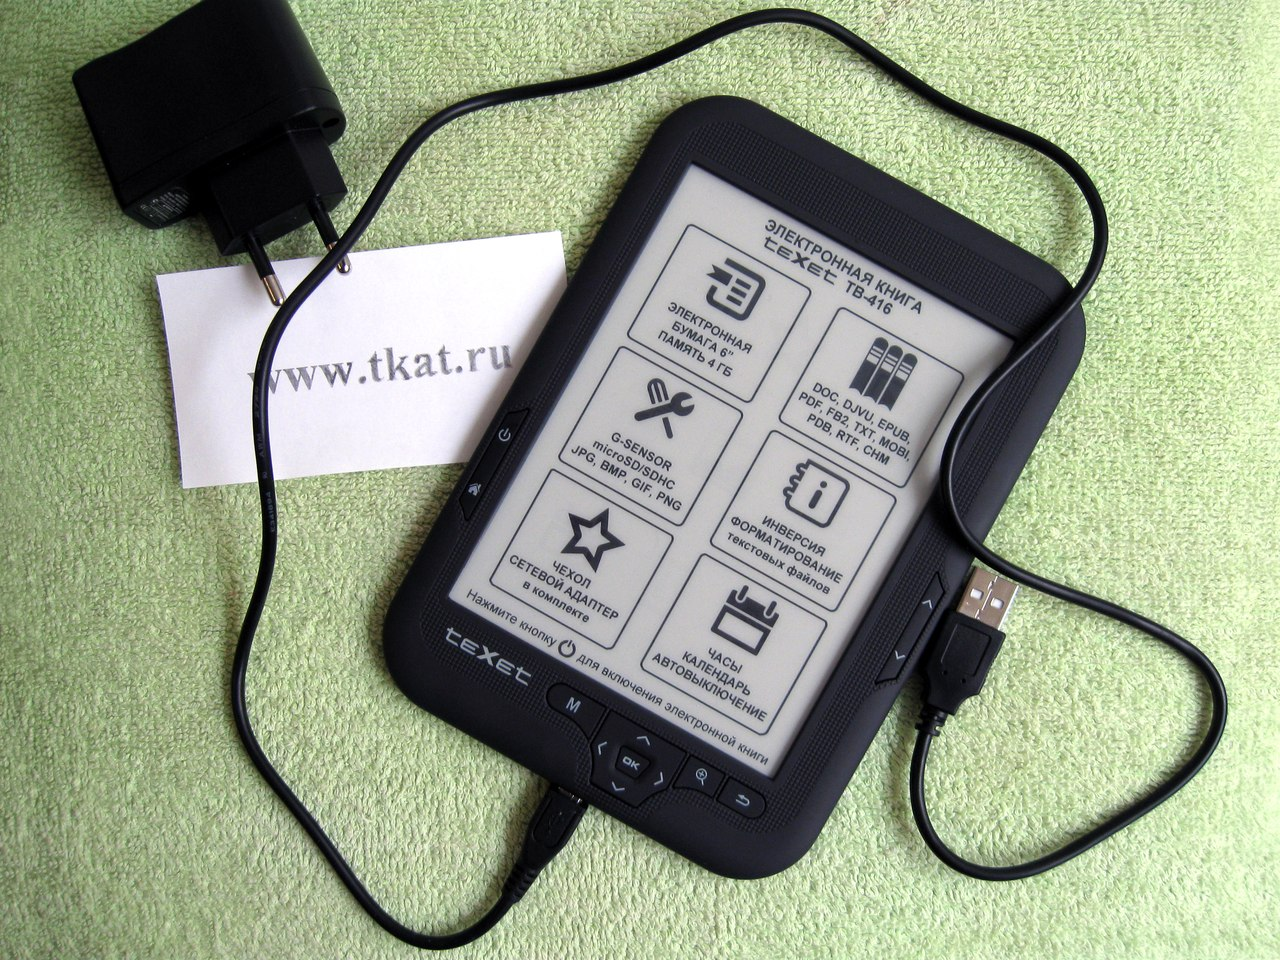 Электронная книга — википедия. что такое электронная книга